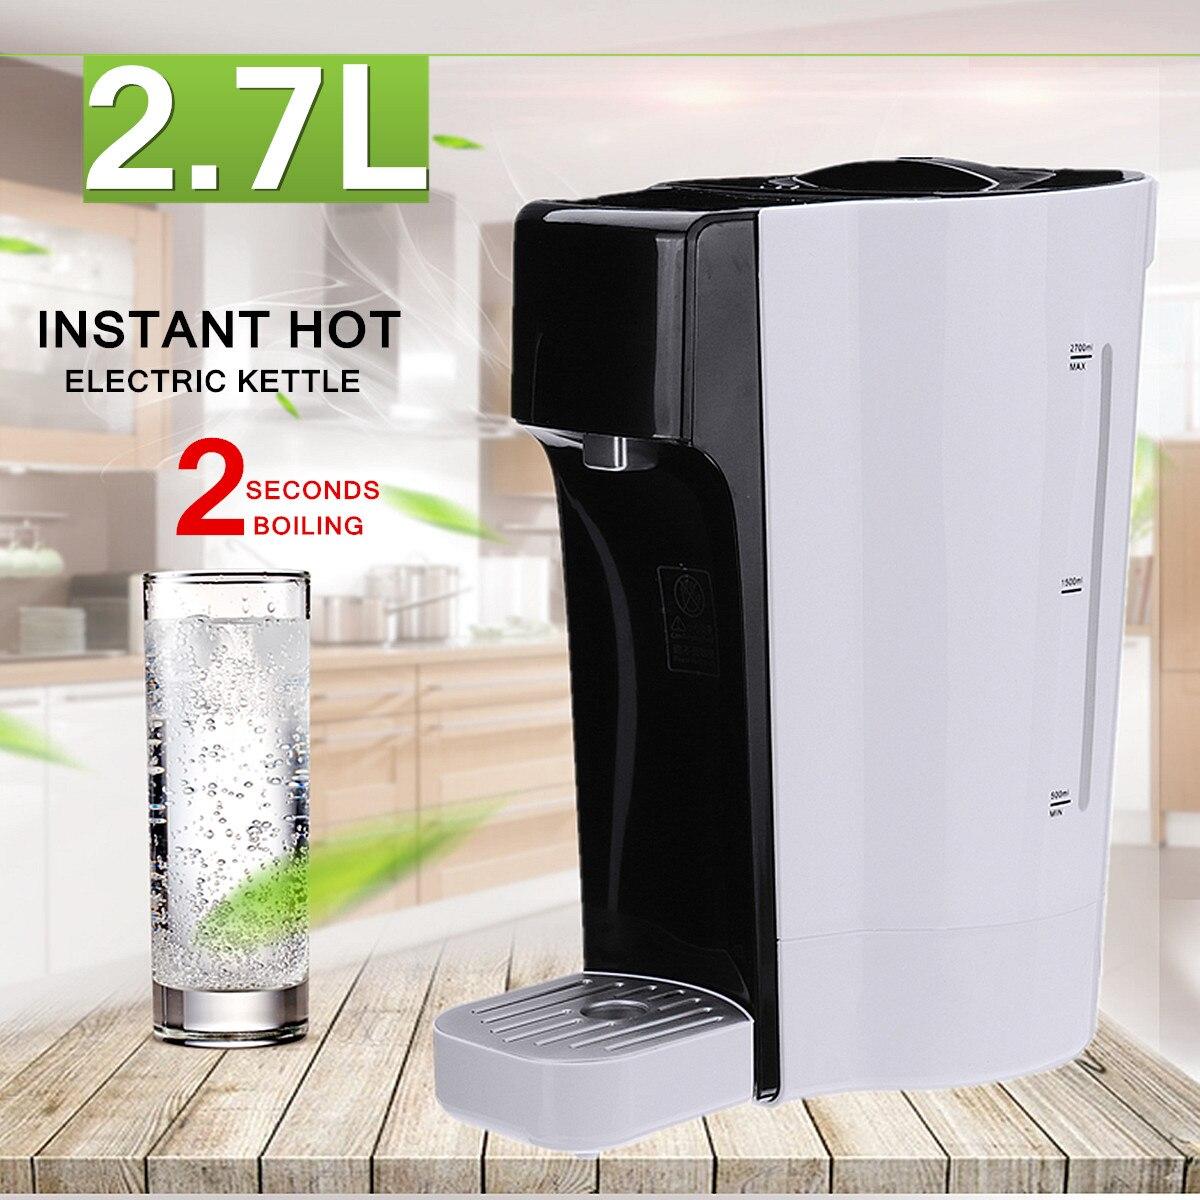 Instant Hot Electric Kettle 2200W 2.7L Tea Coffee Maker Water Boiling Dispenser Machine Home Desktop Office Food Grade Screen